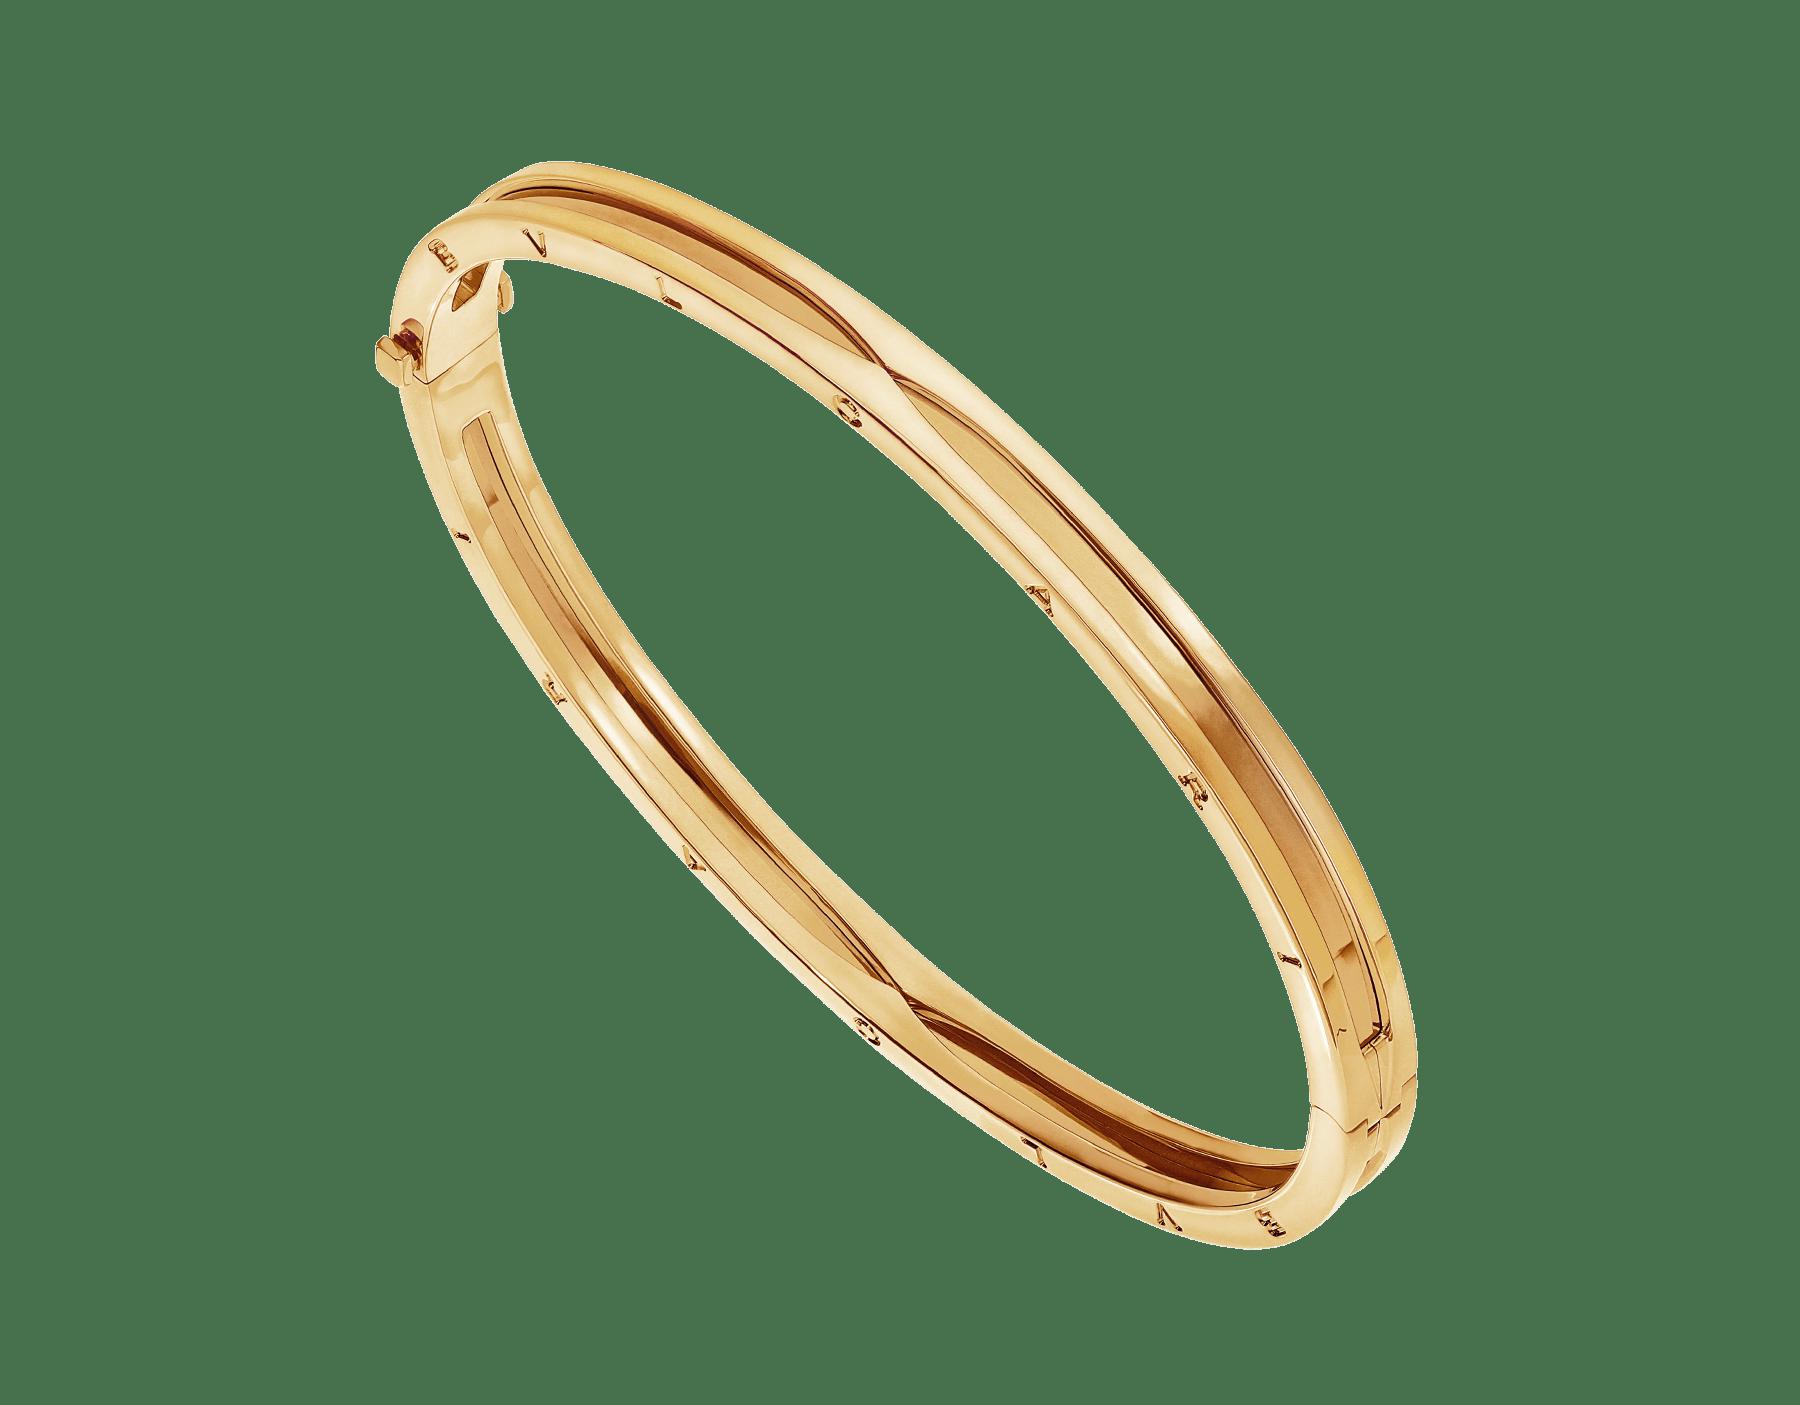 Pulsera rígida B.zero1 en oro amarillo de 18qt BR858726 image 1